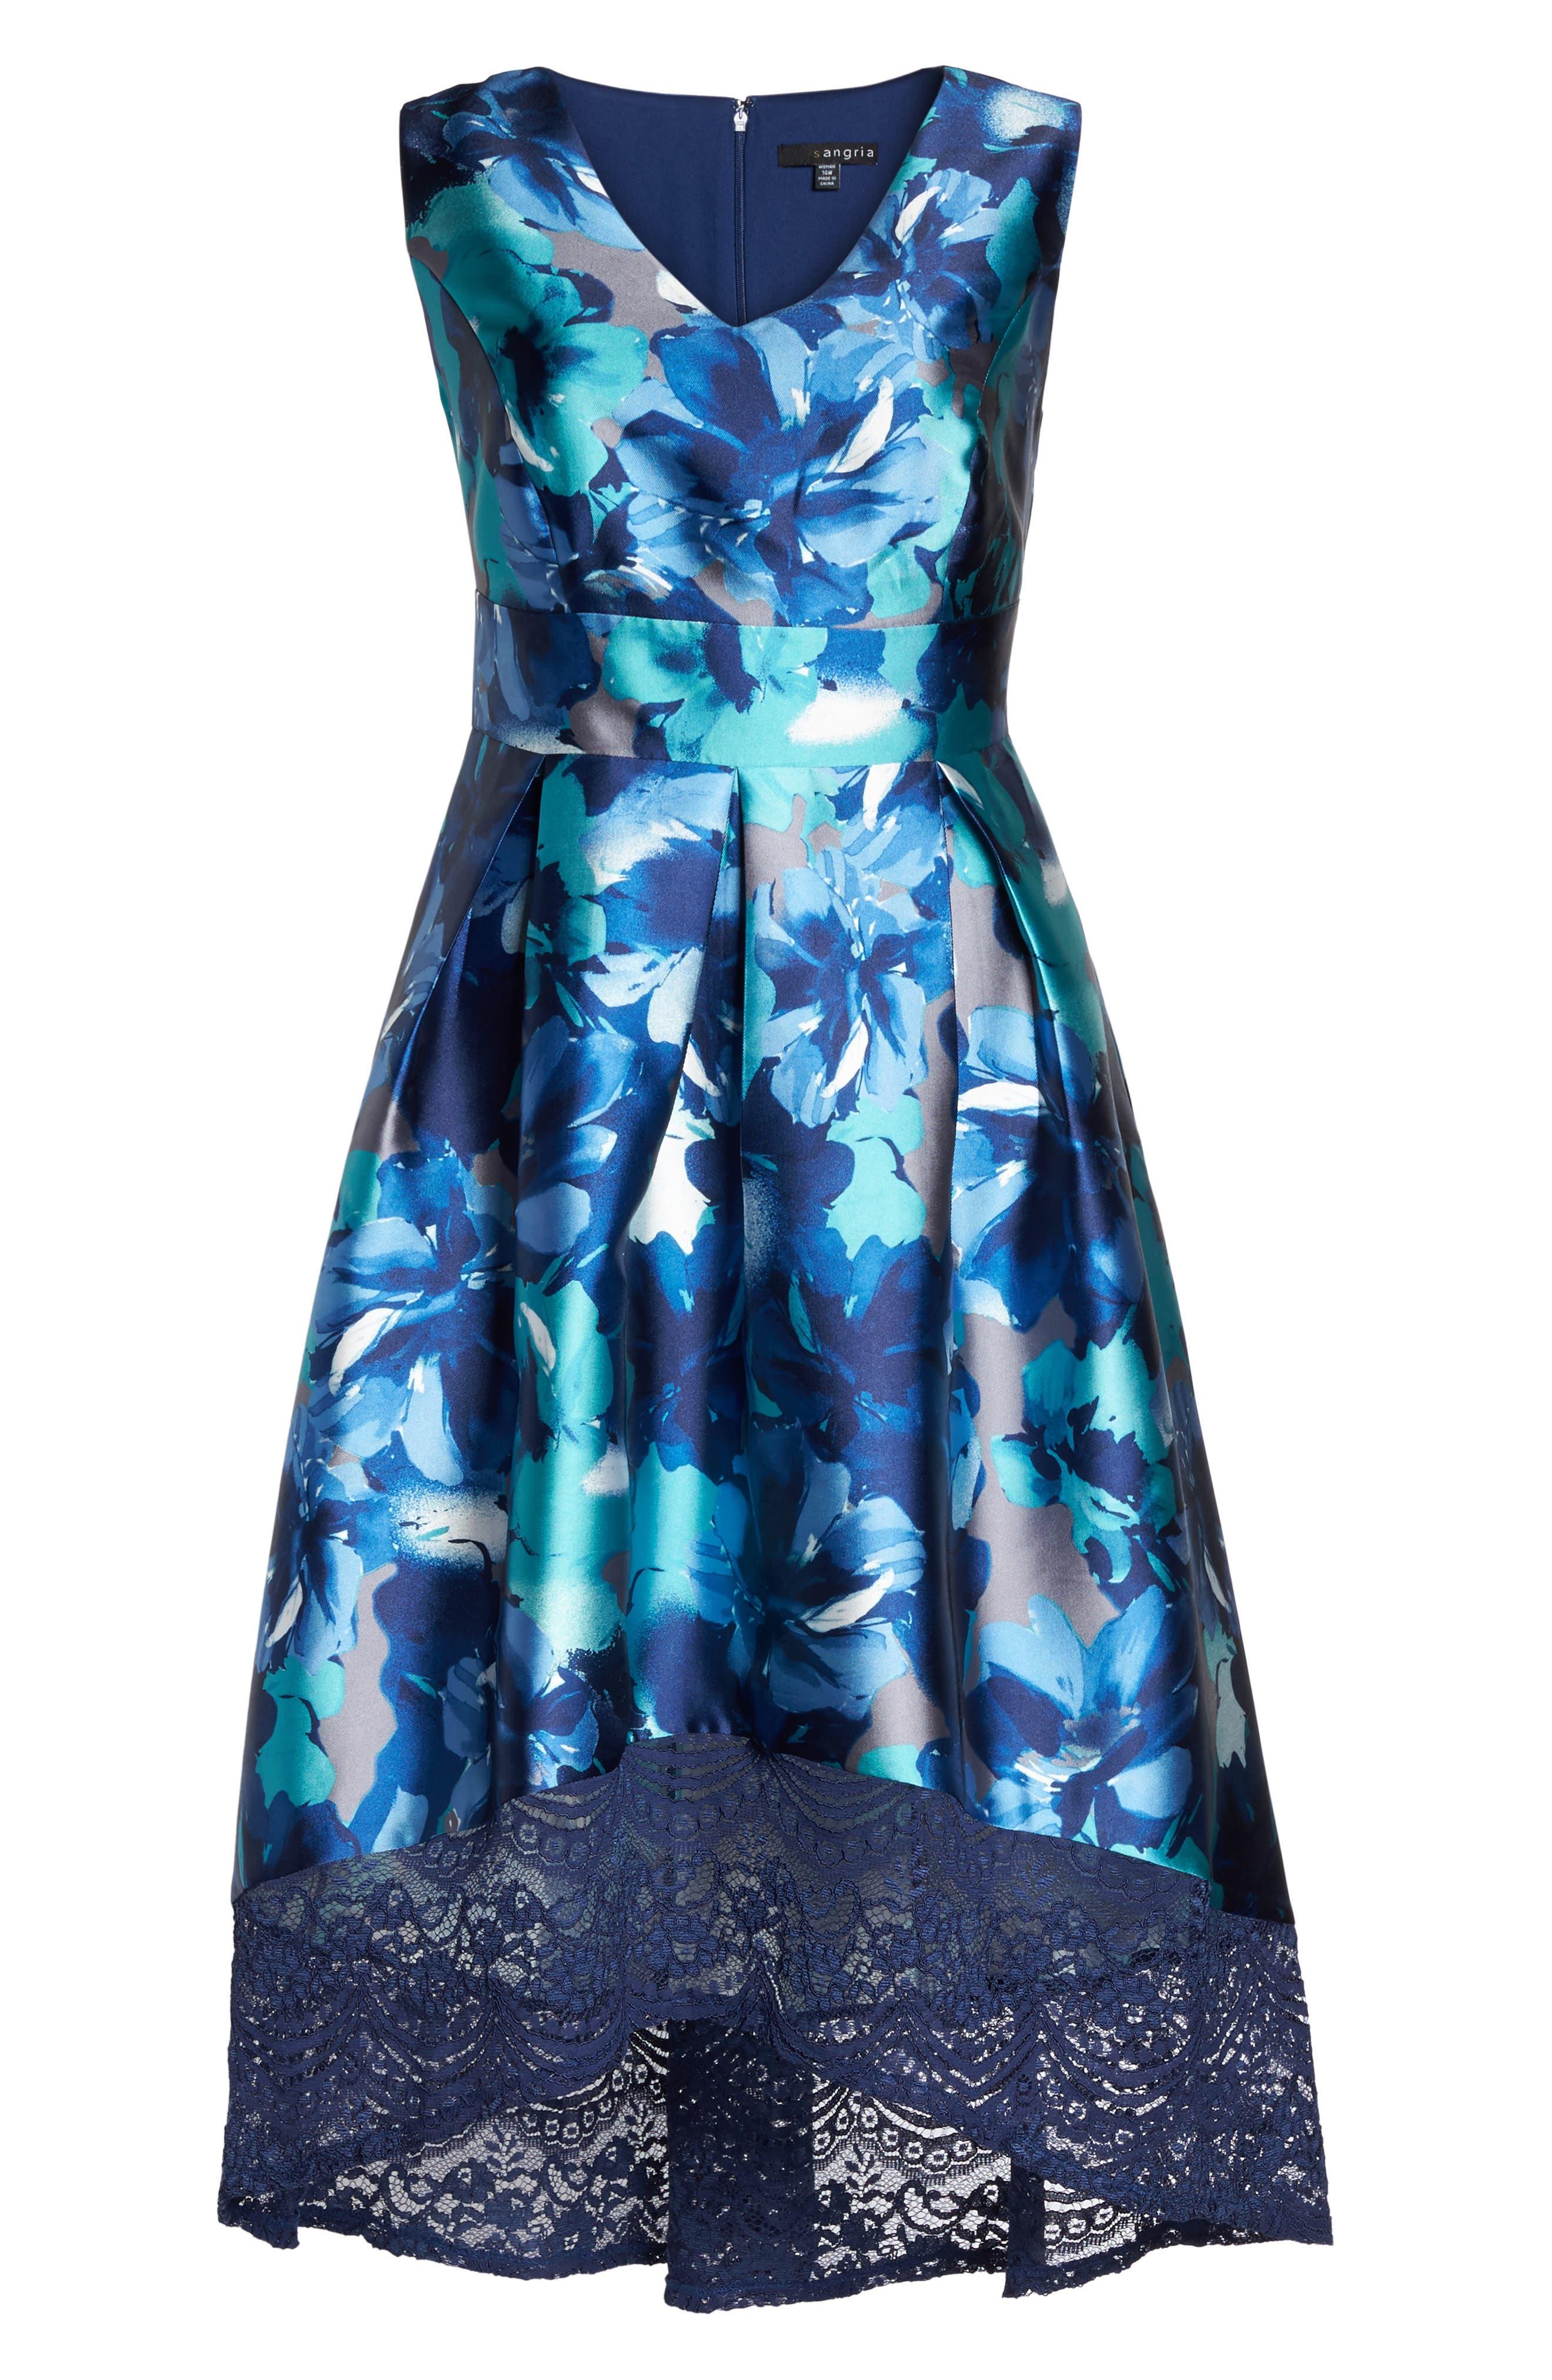 Watercolor Floral High/Low Dress,                             Alternate thumbnail 6, color,                             460